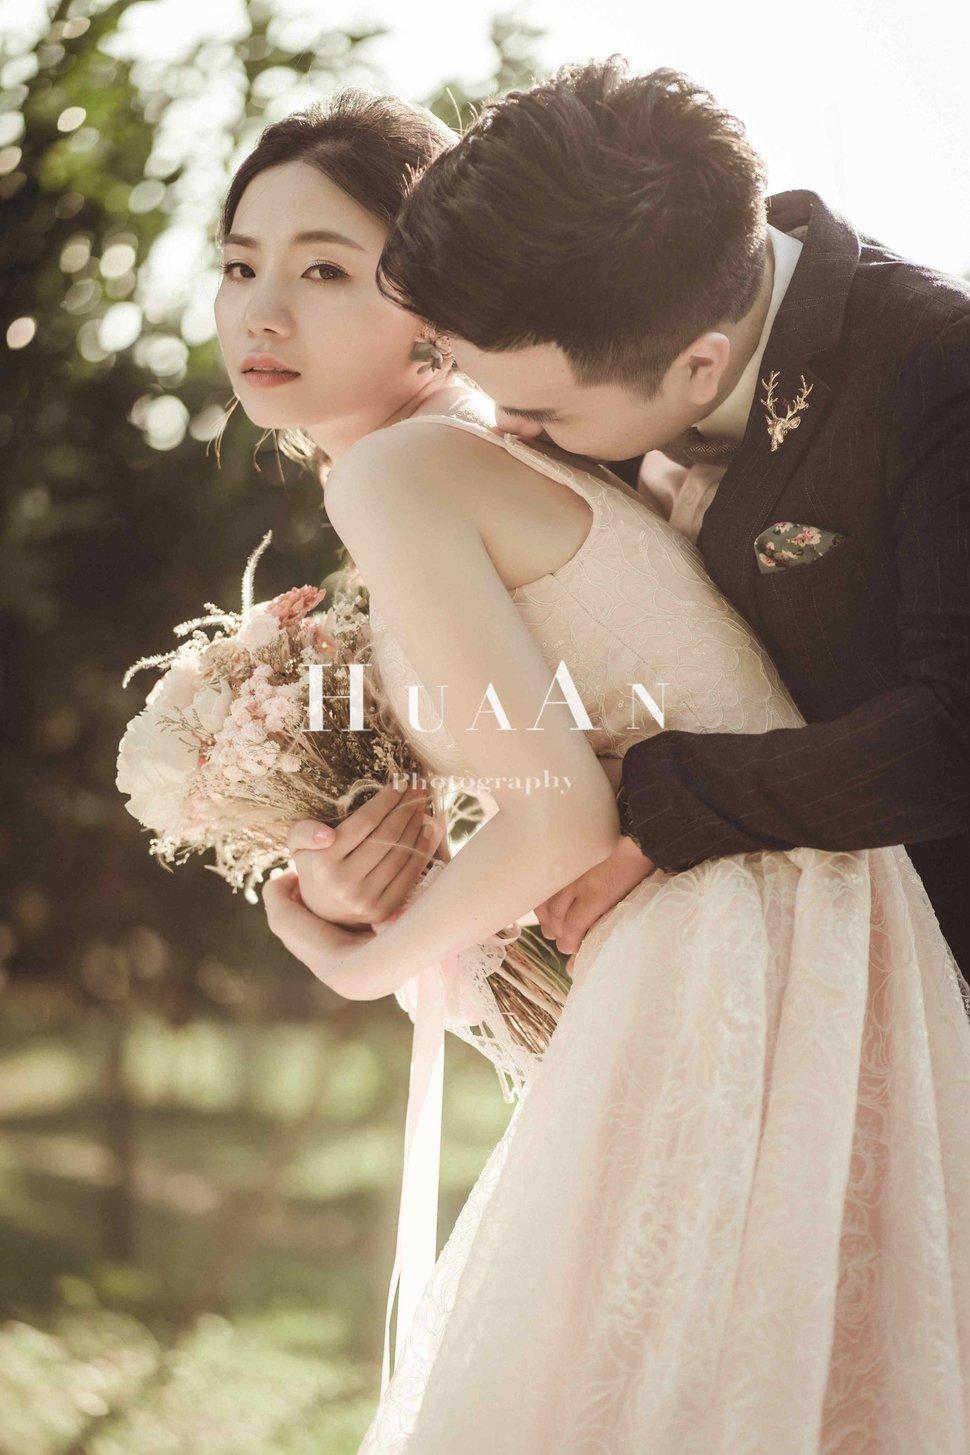 DSC04824 - Huaan Photography《結婚吧》